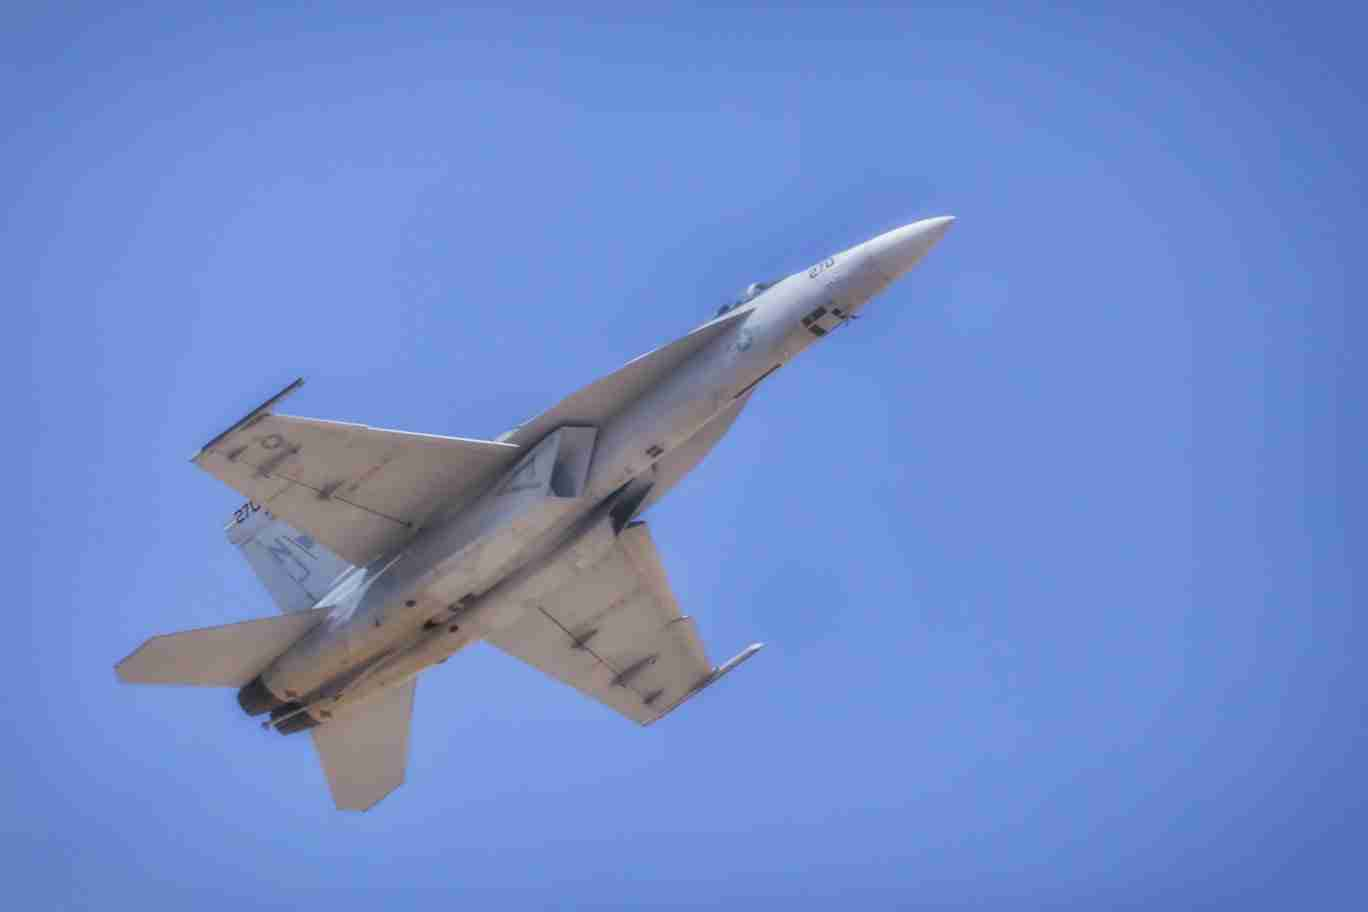 F/A-18 Super Hornet Underbelly